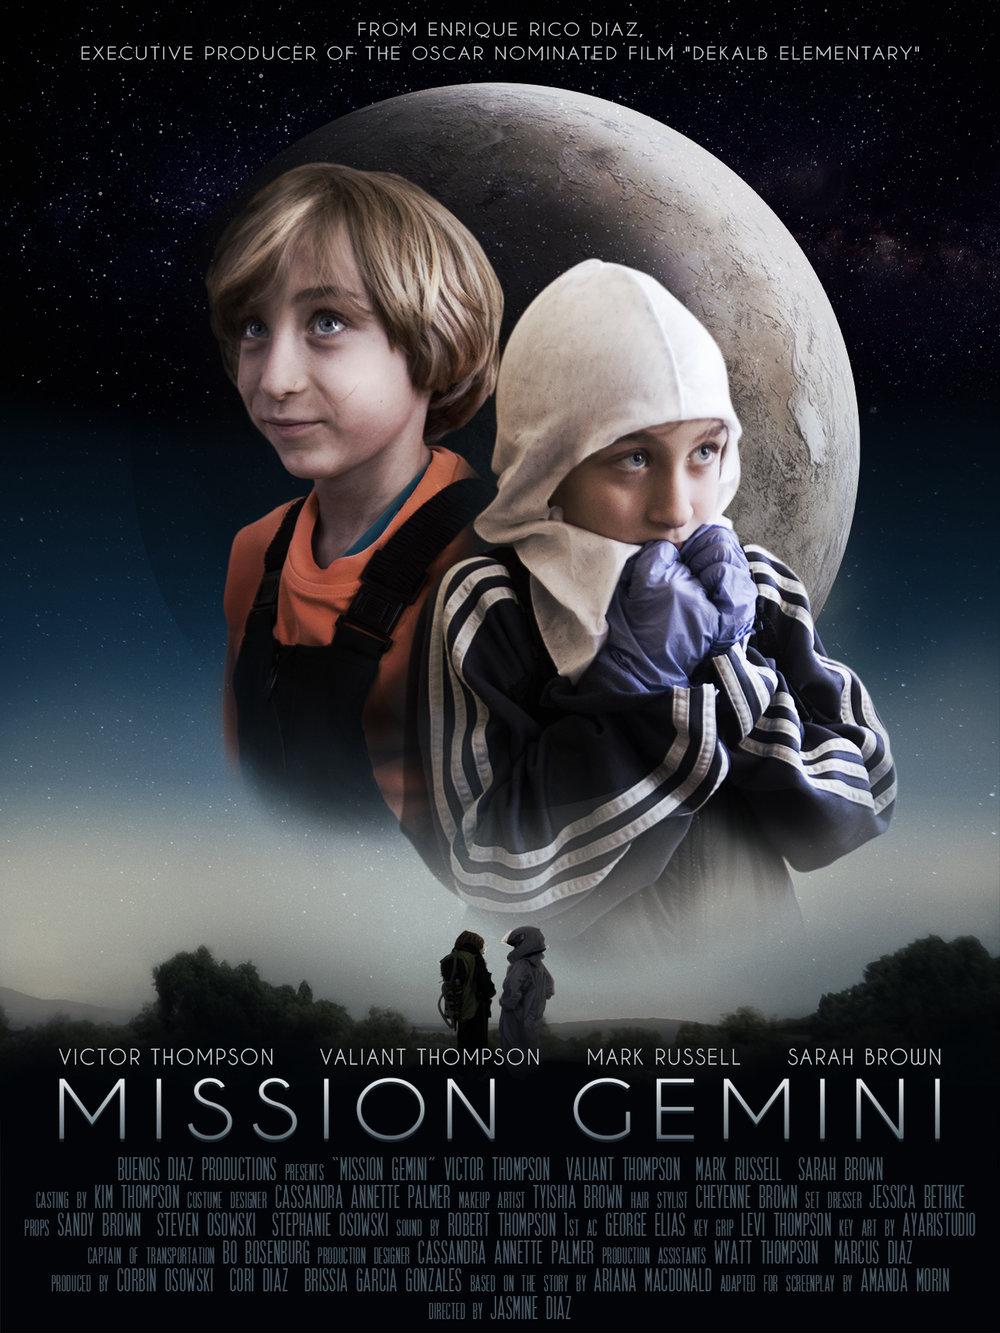 """Mission Gemini""  Movie poster for short action film June 2018"